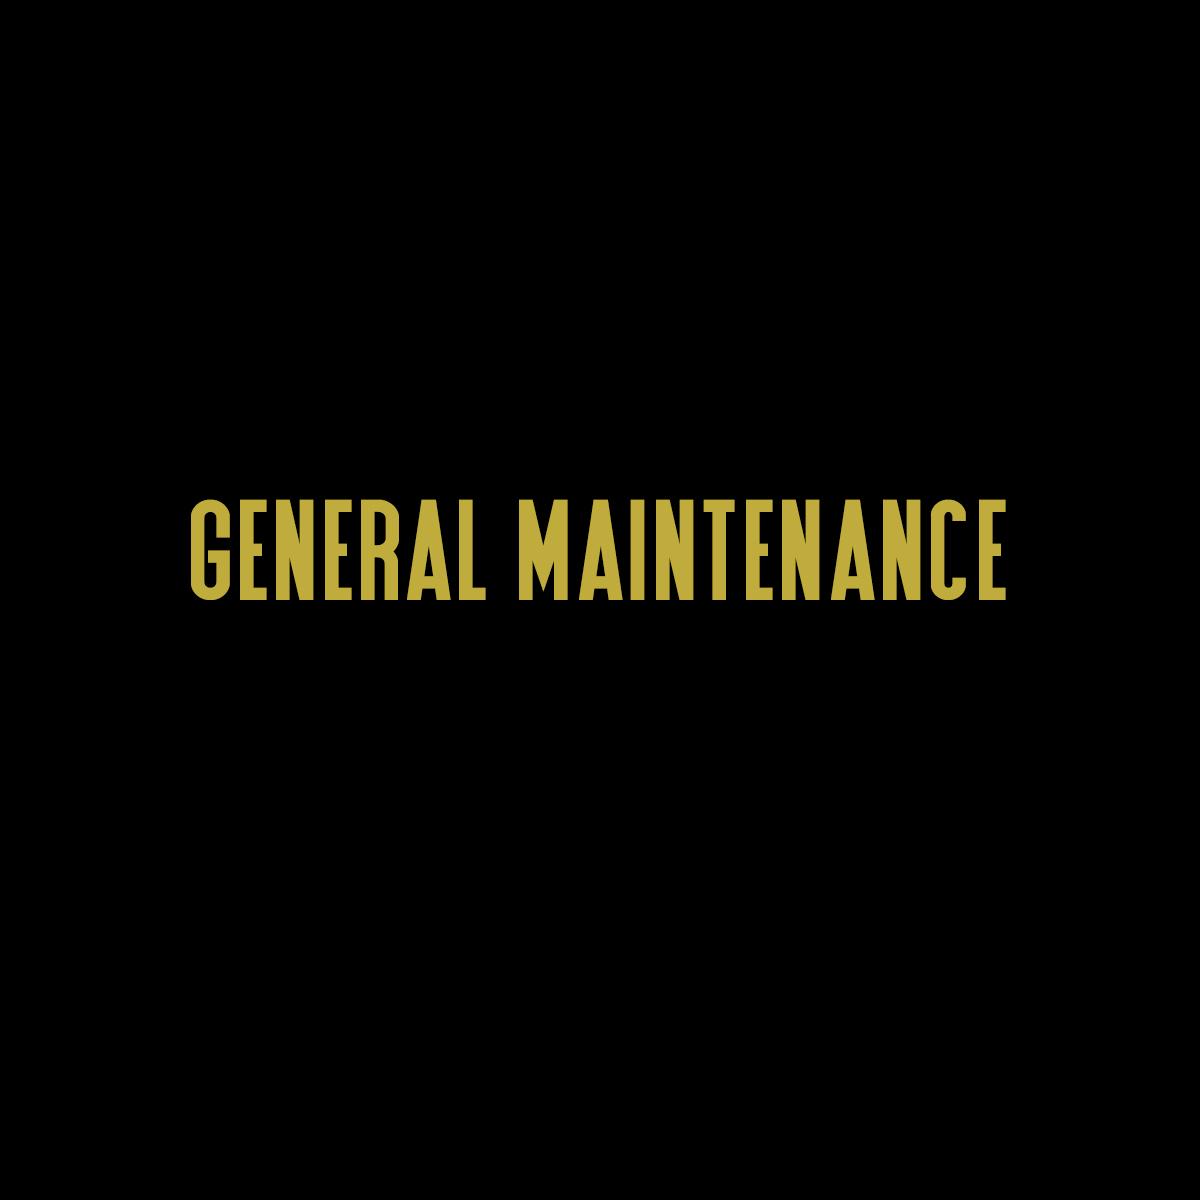 General Maintenance.jpg